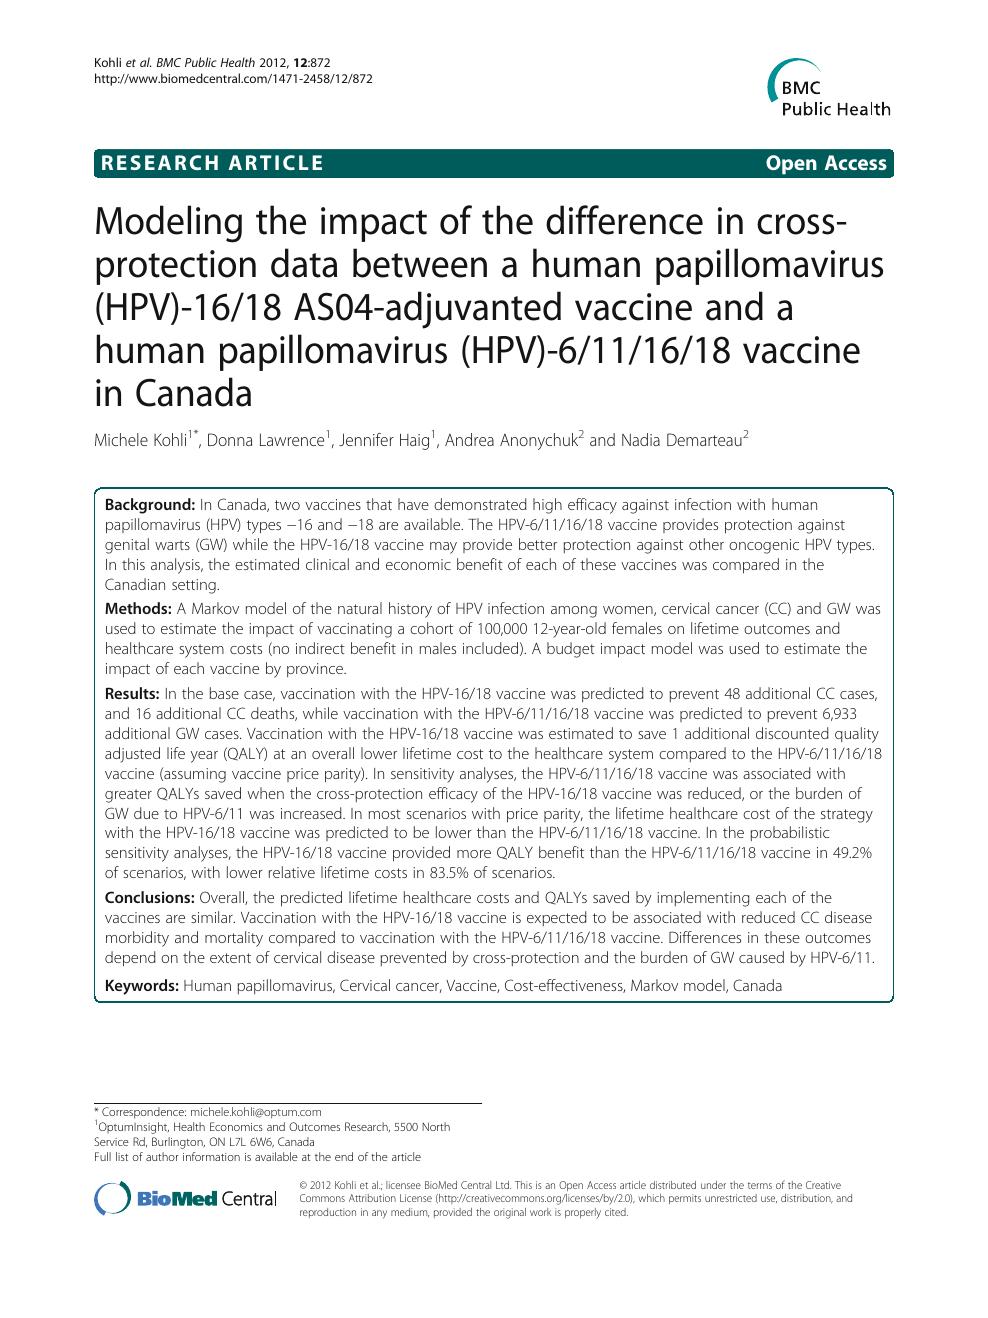 human papillomavirus vaccine monograph)